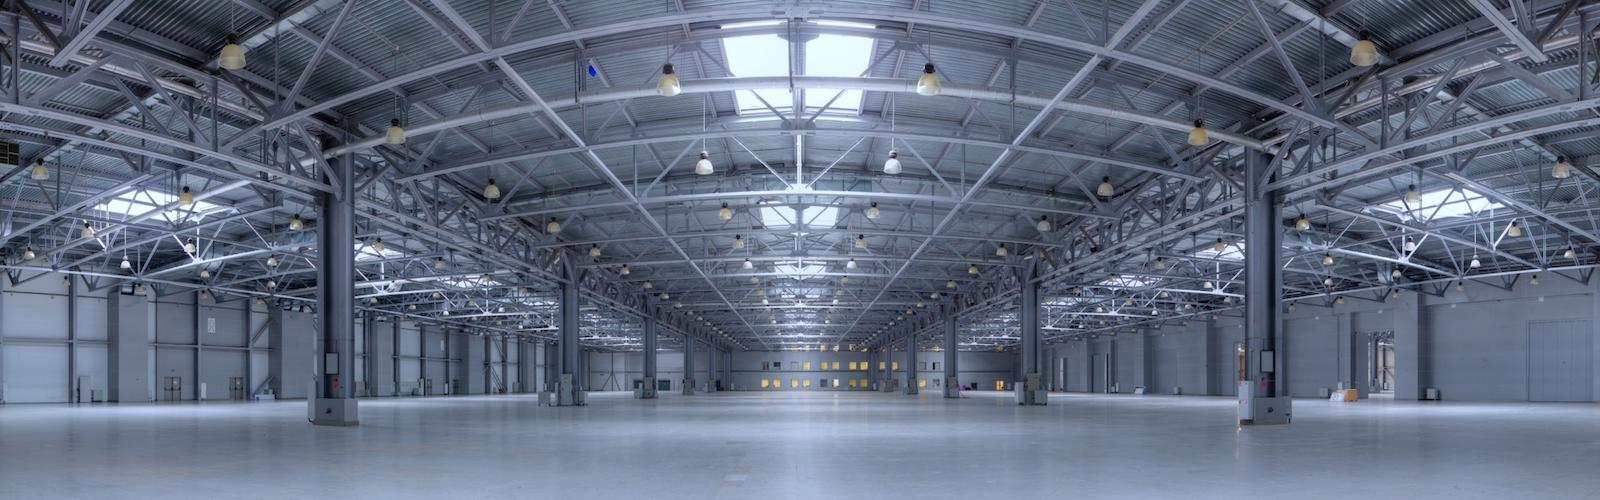 Warehouse-1600-x-500